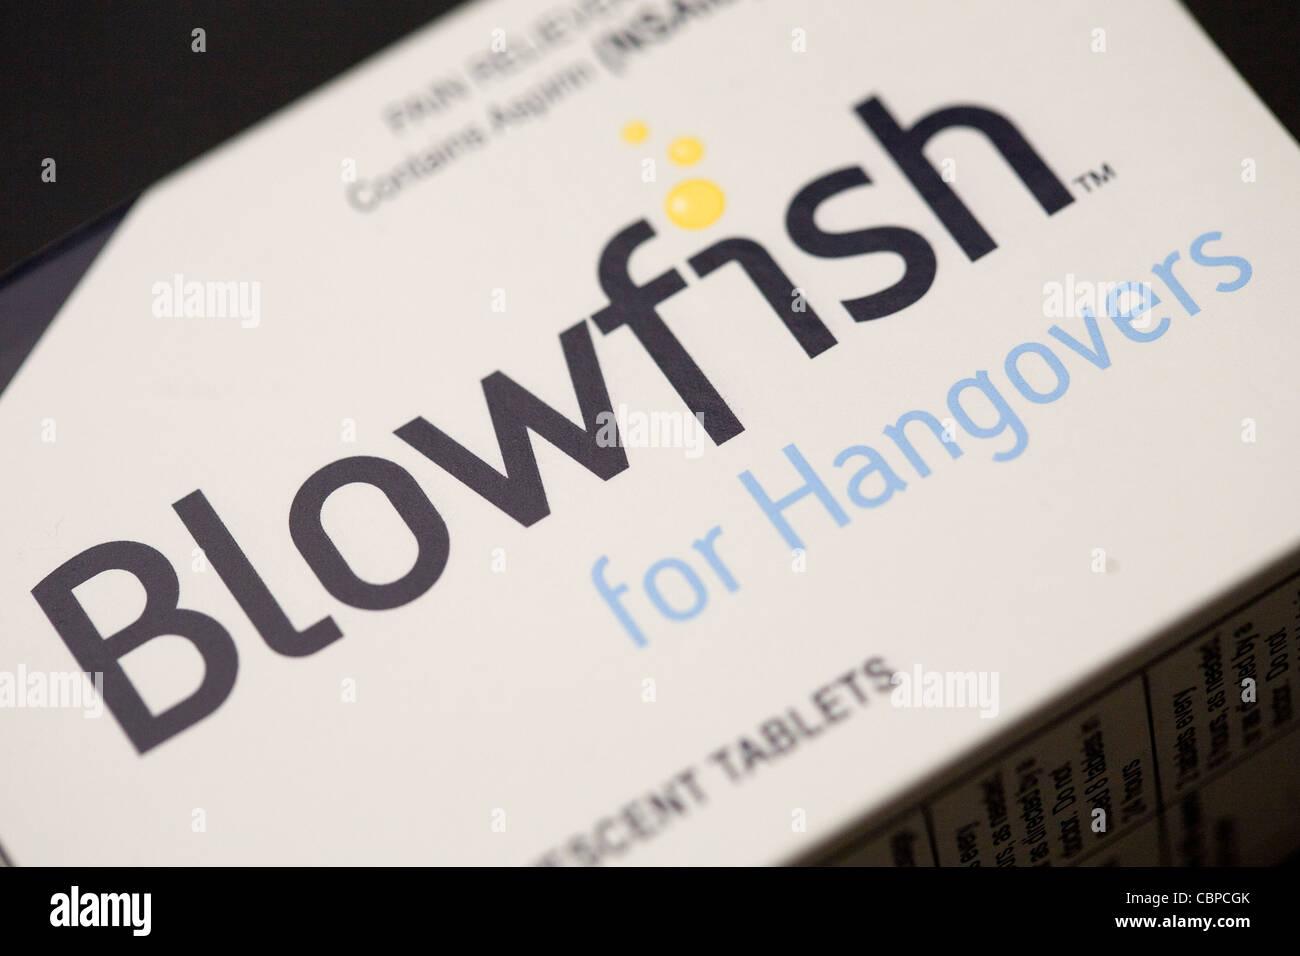 Blowfish - FDA genehmigt Kater. Stockbild